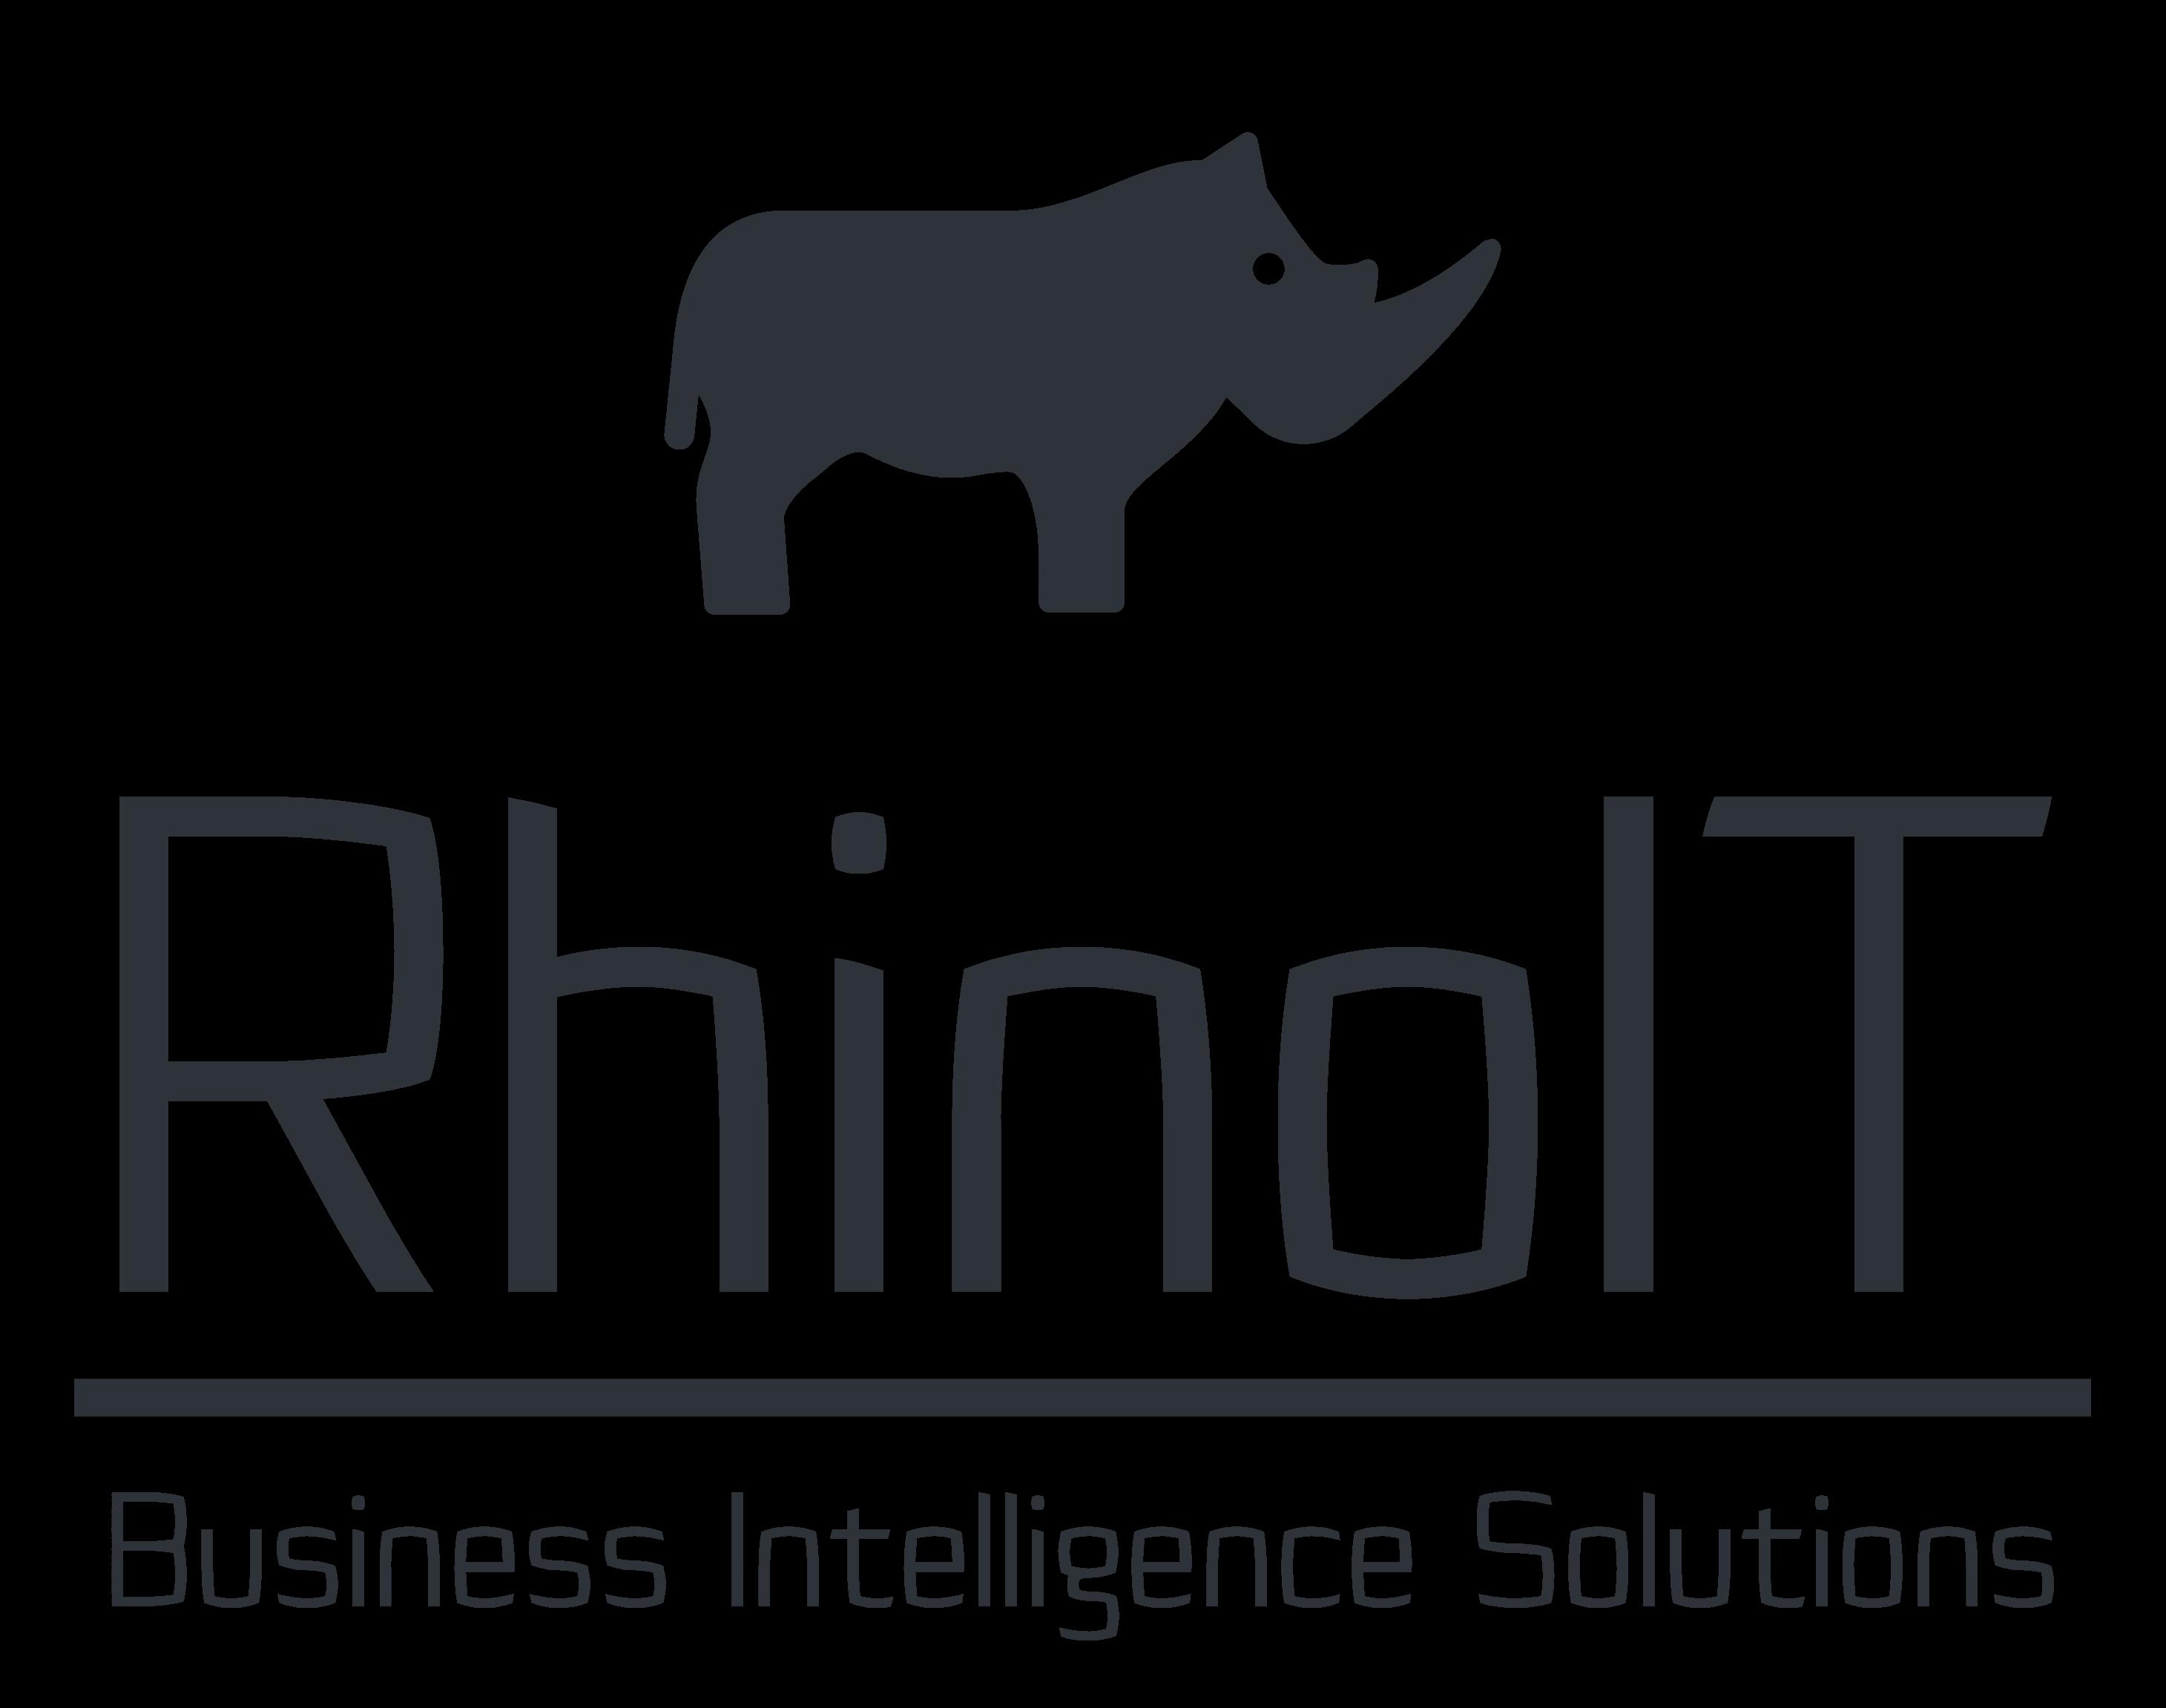 RhinoIT – Business Intelligence Solutions